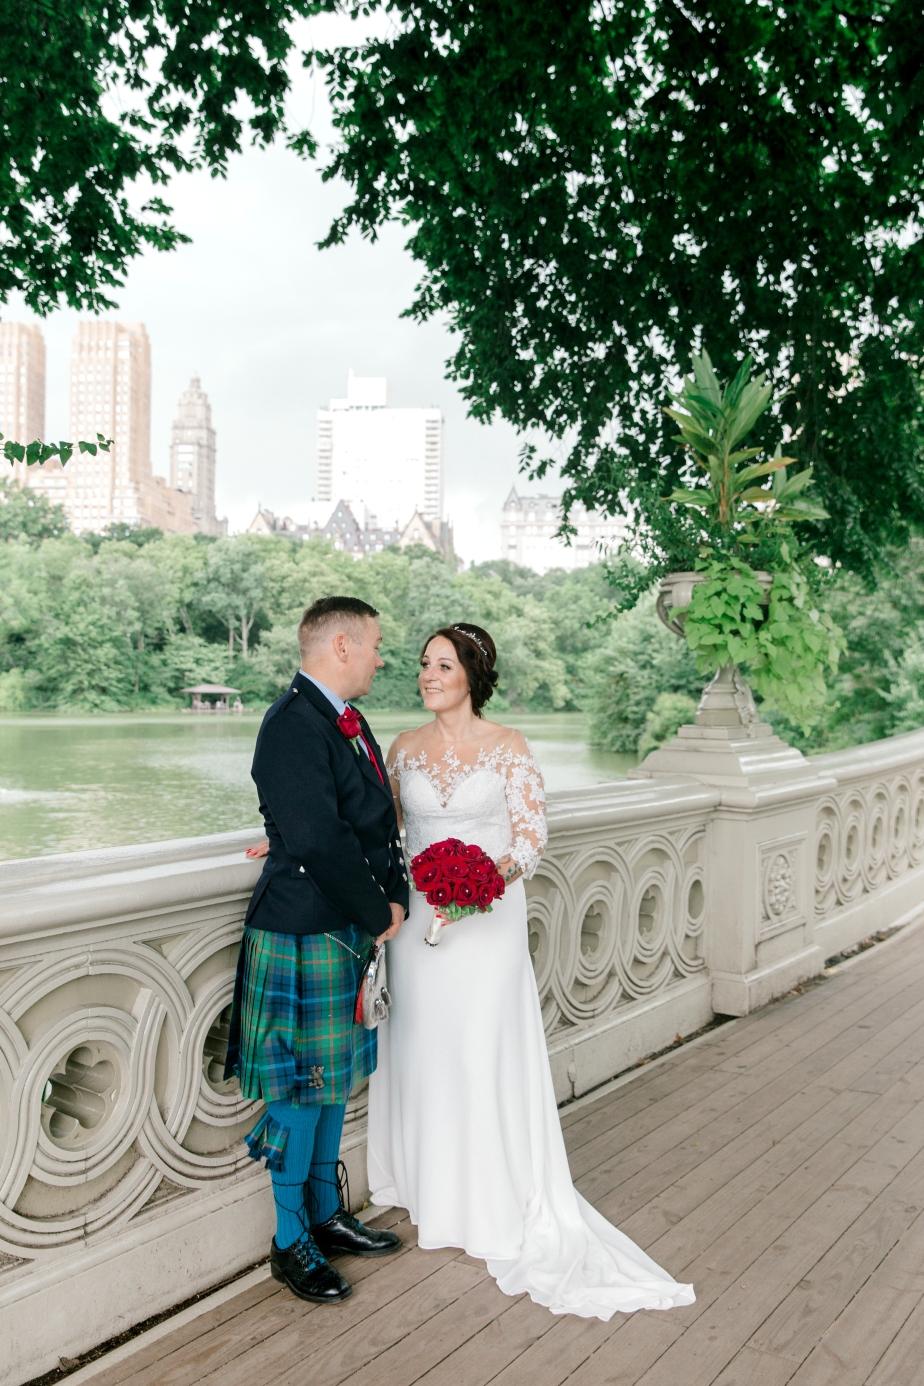 Central-park-wedding-JA-275